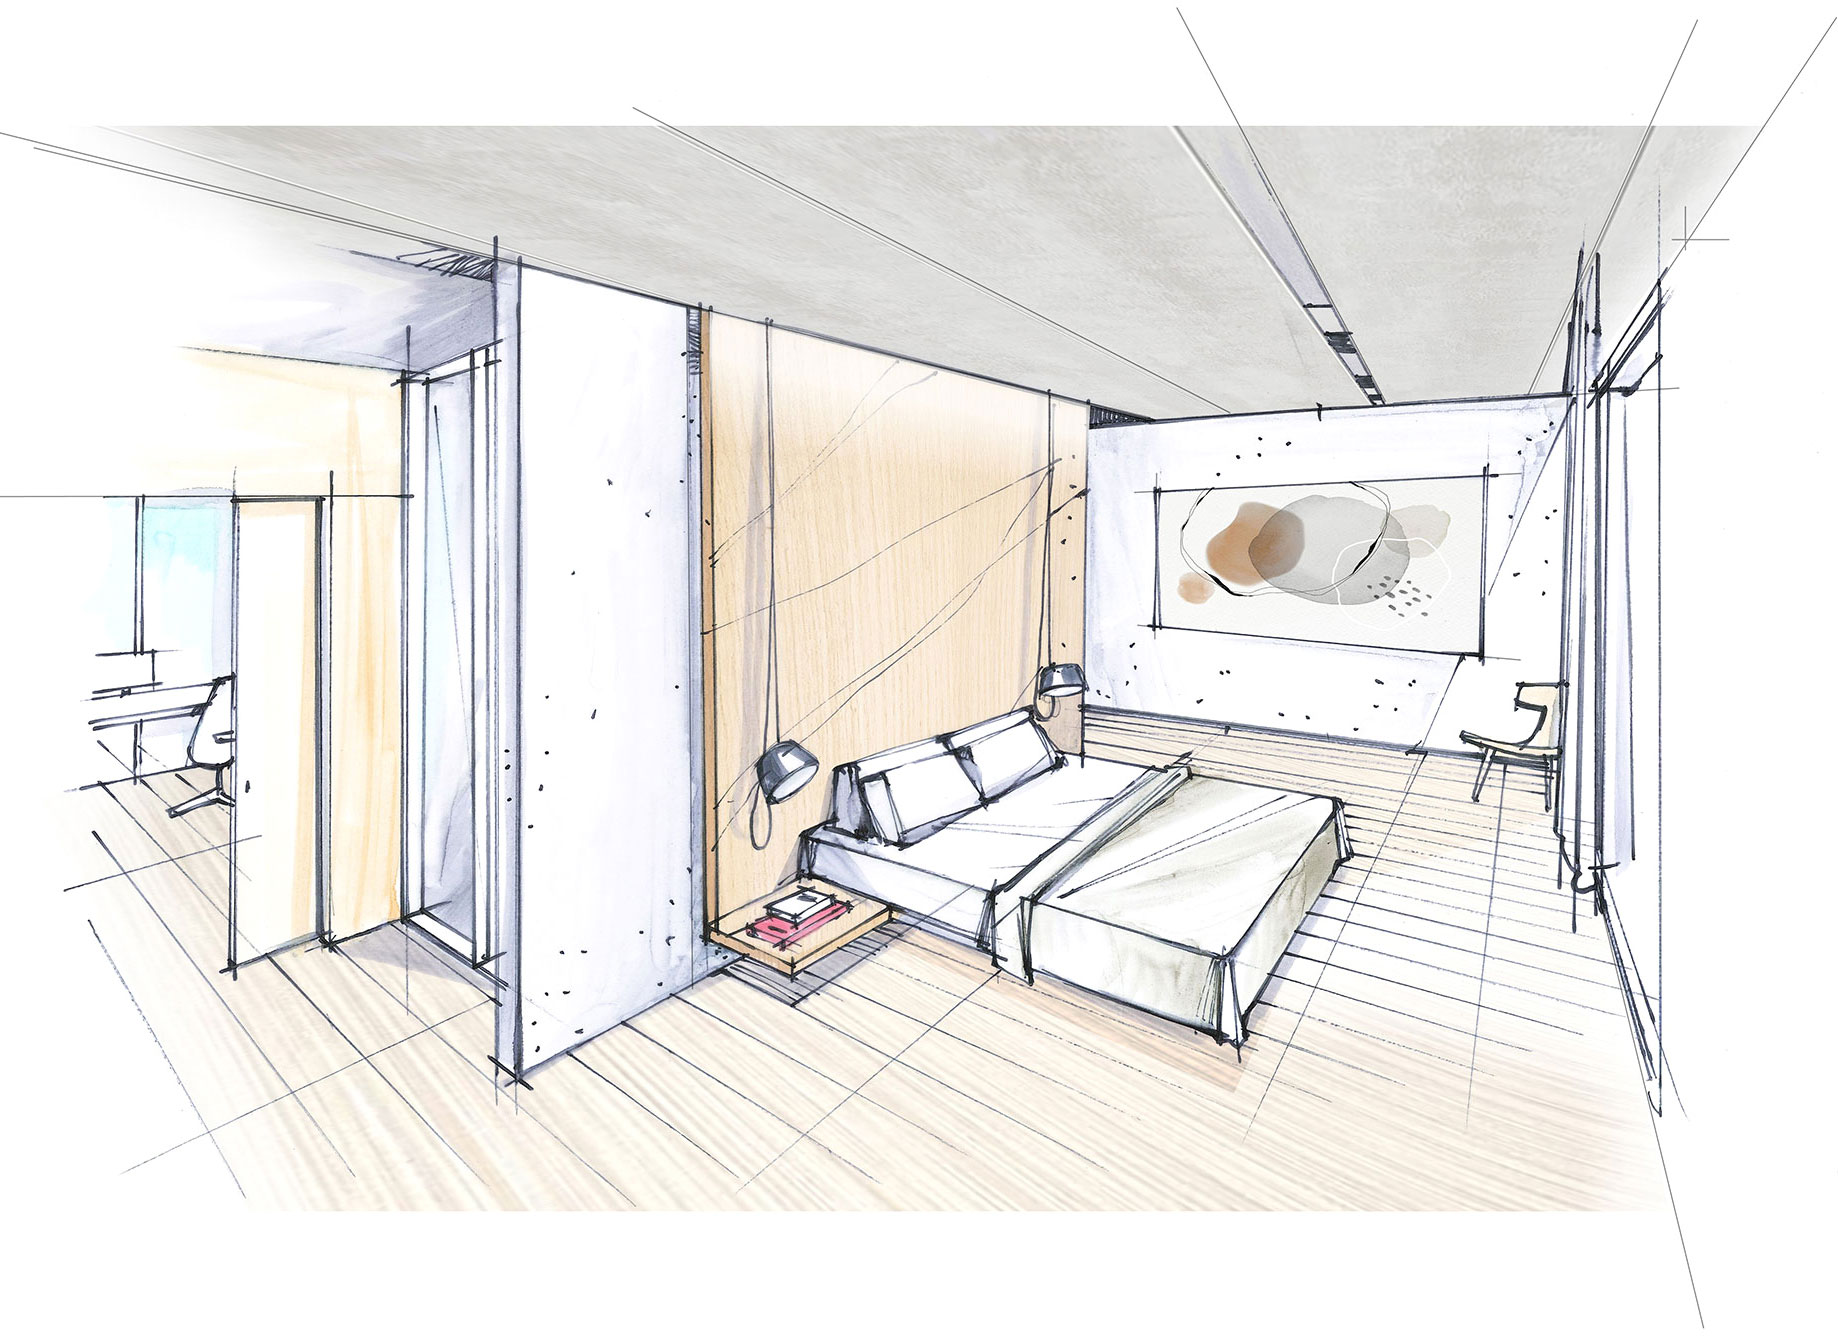 homann-architects-architektur-skizze-home